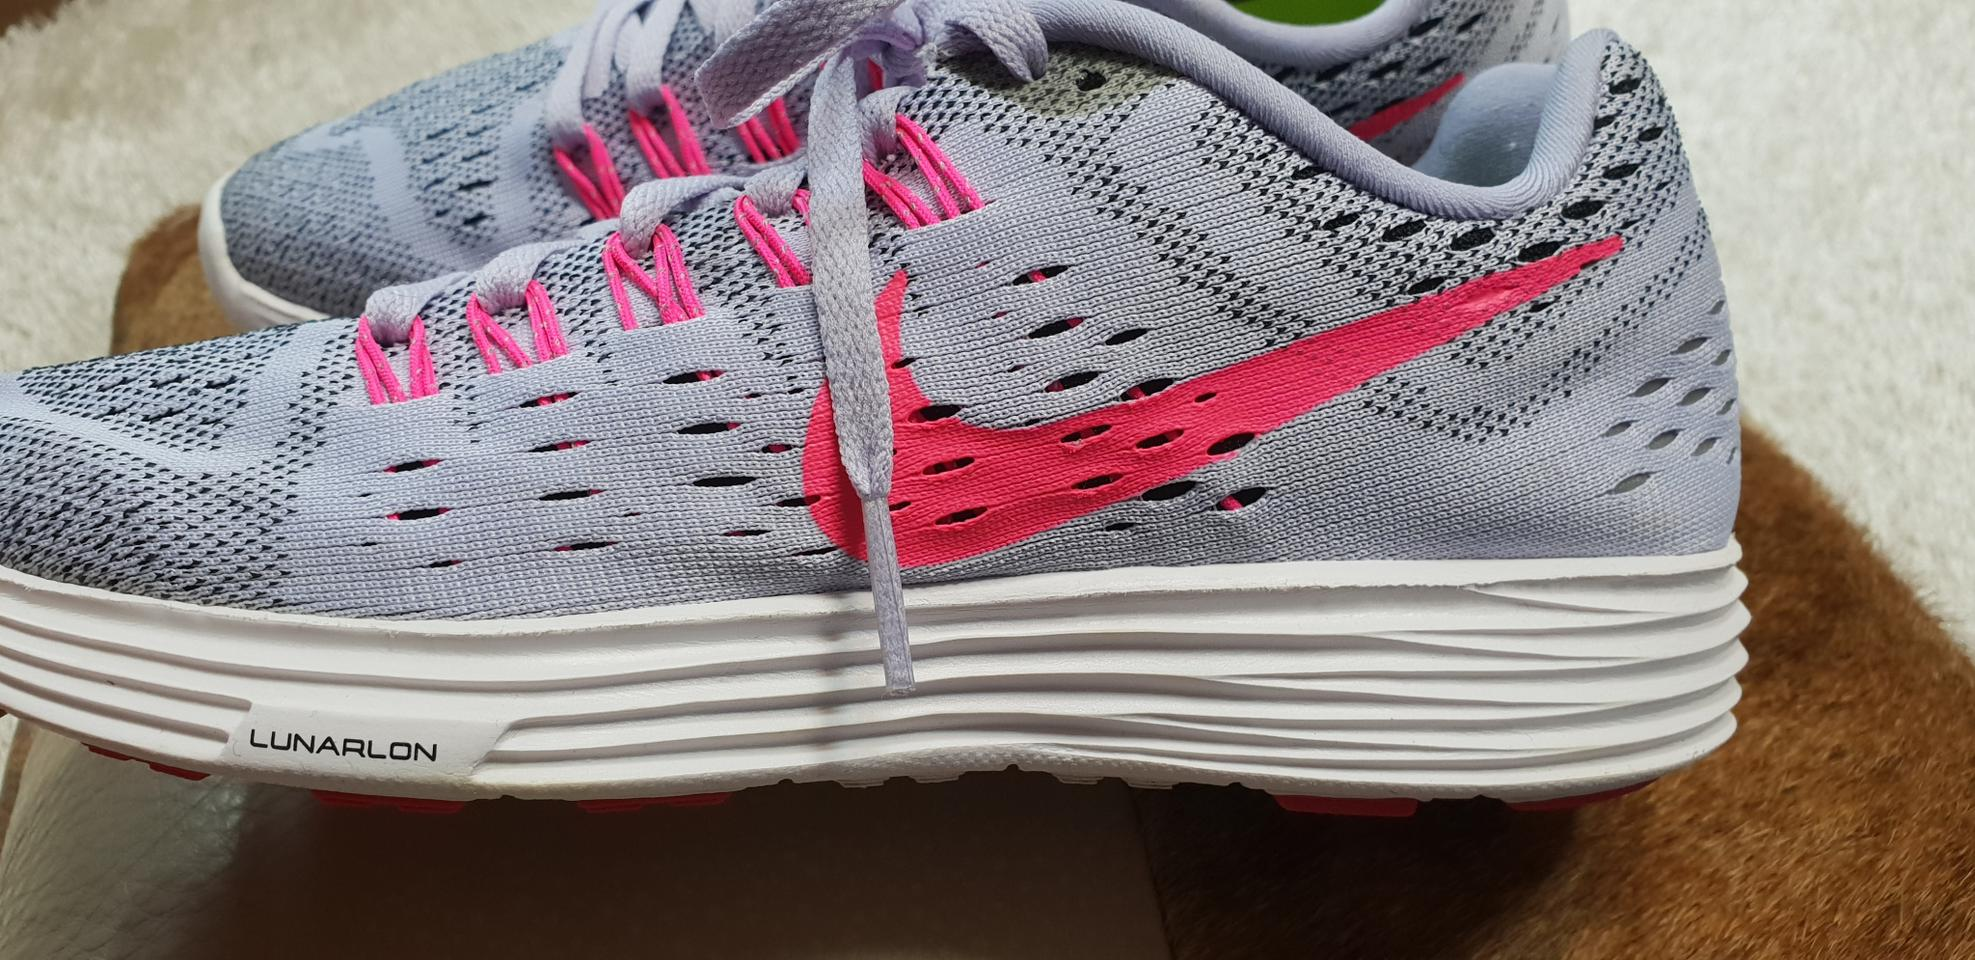 b1bb17a34c9 ♥나이키(정품)240mm(여성)신발♥ | 헬로마켓 - 100% 안전한 중고거래 장터